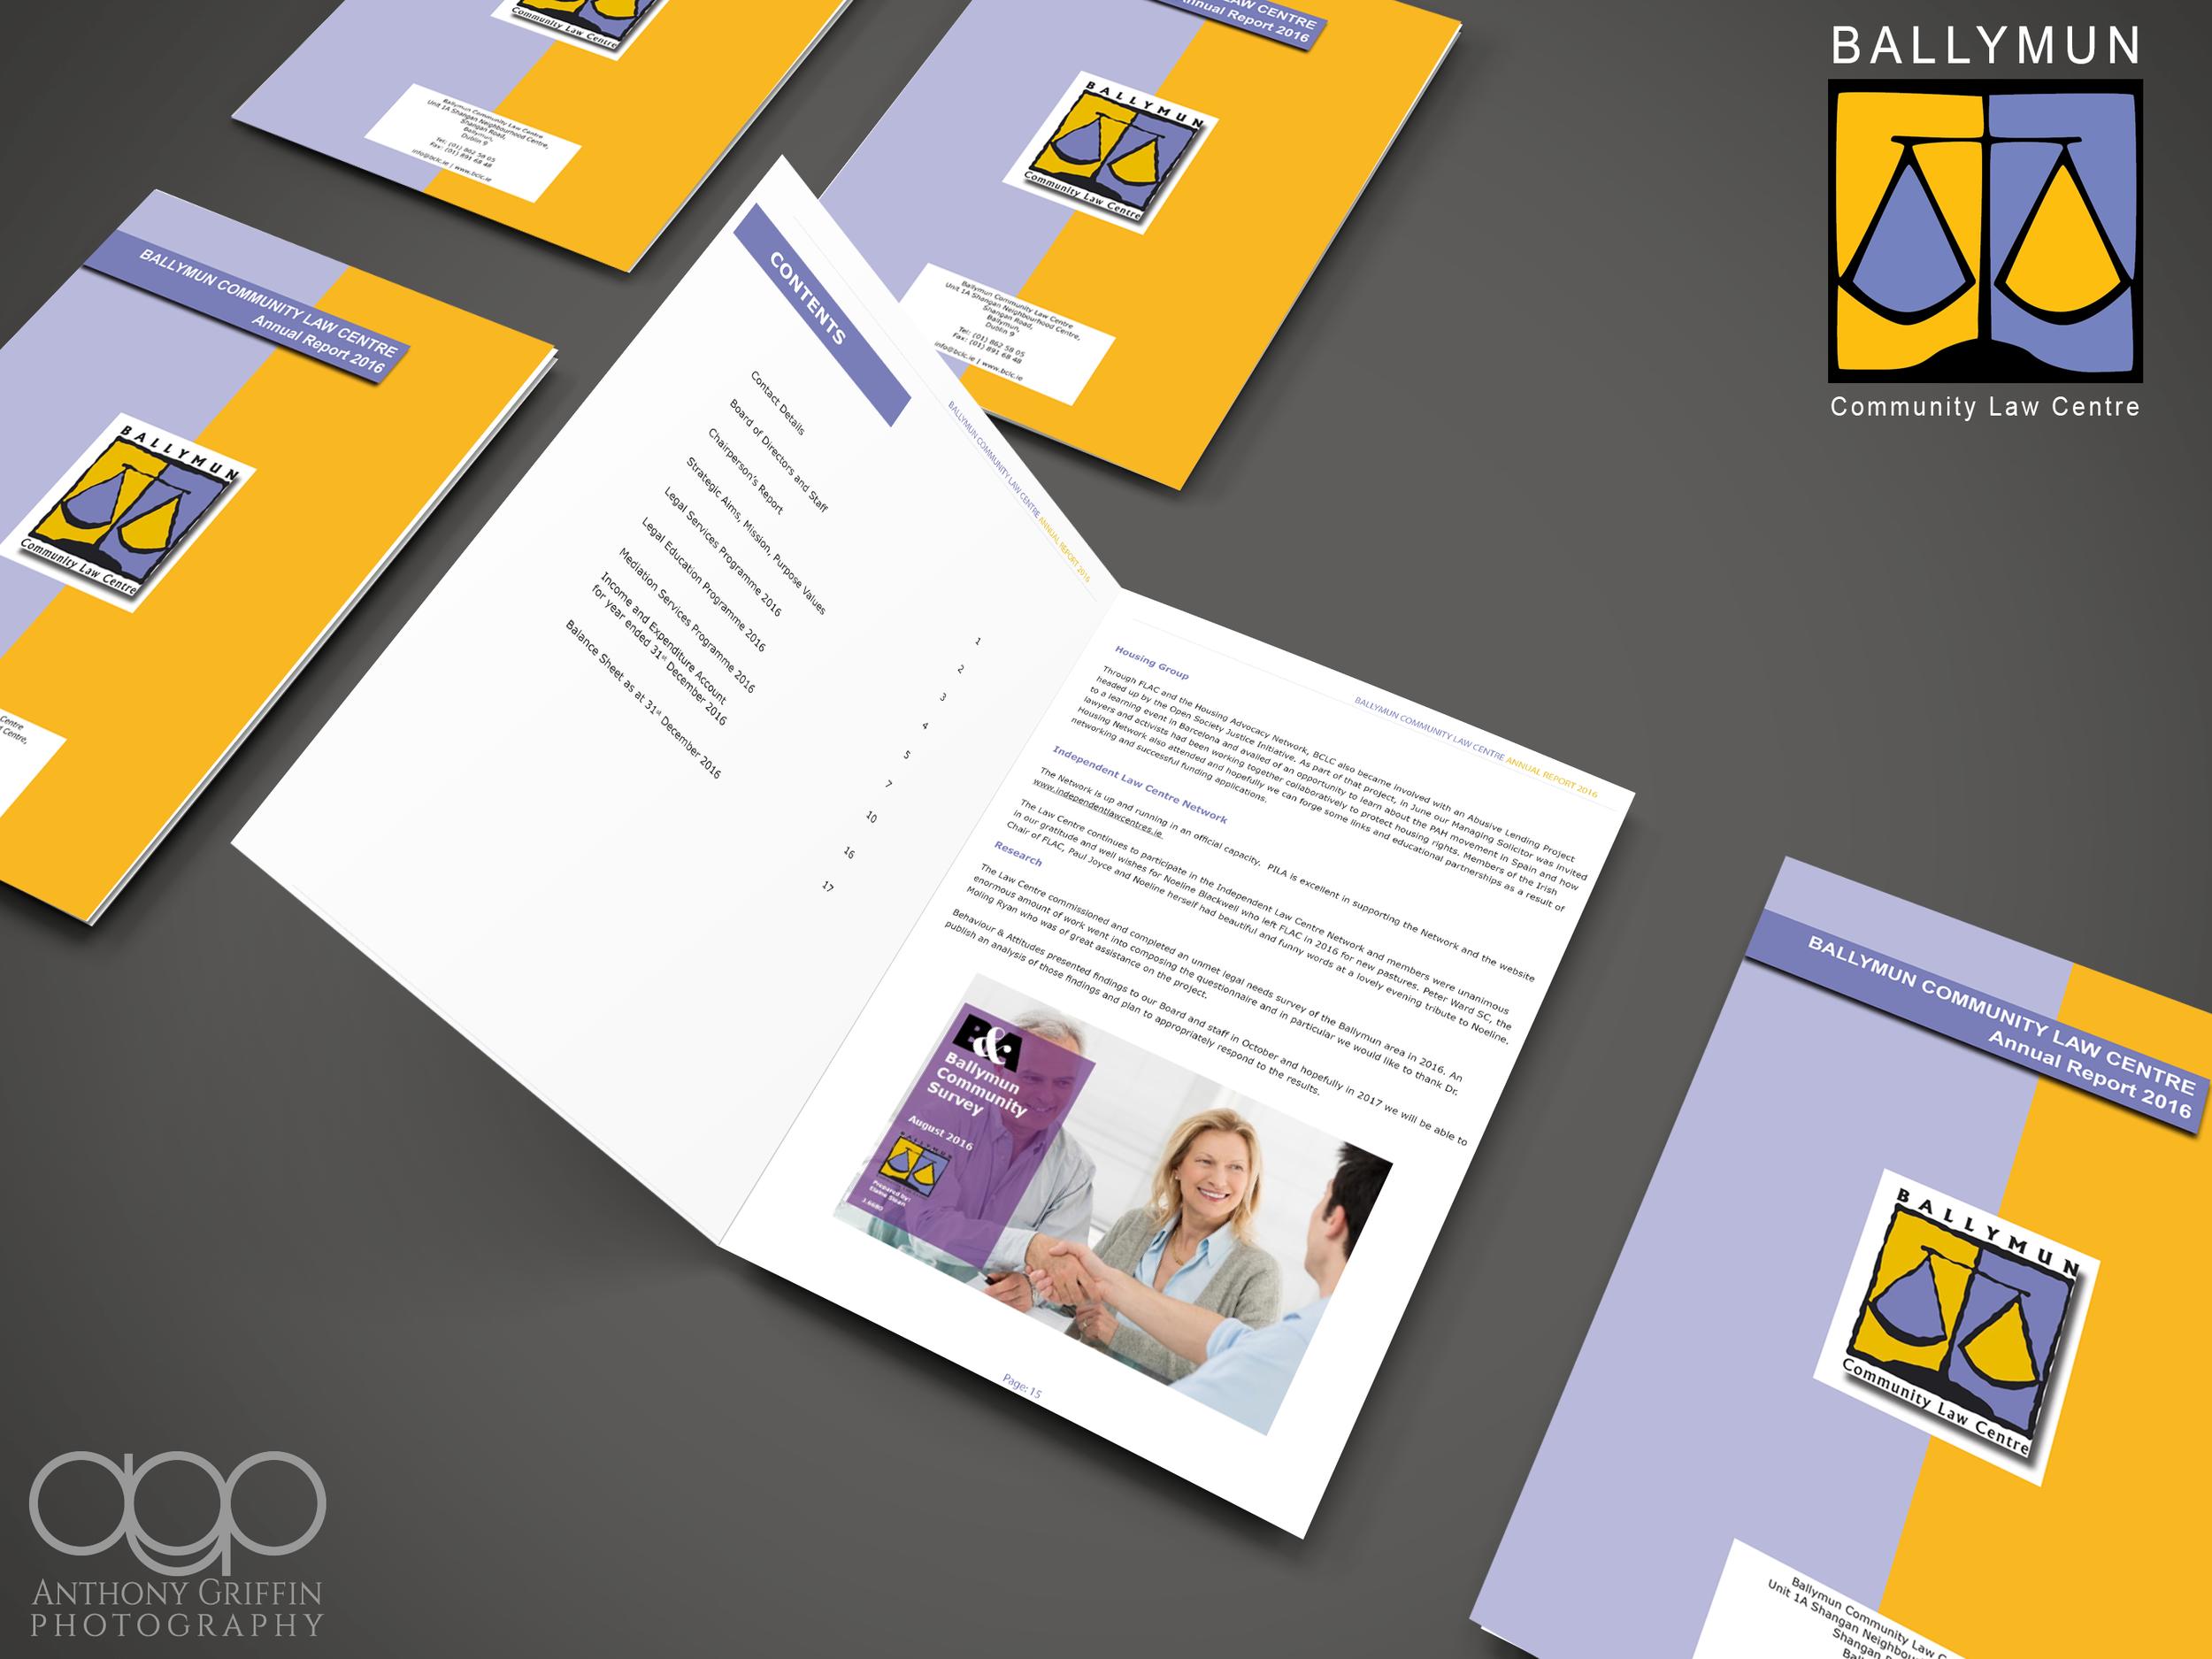 Desktop Publishing, Layout & Design :: contact anthony@agp.ie